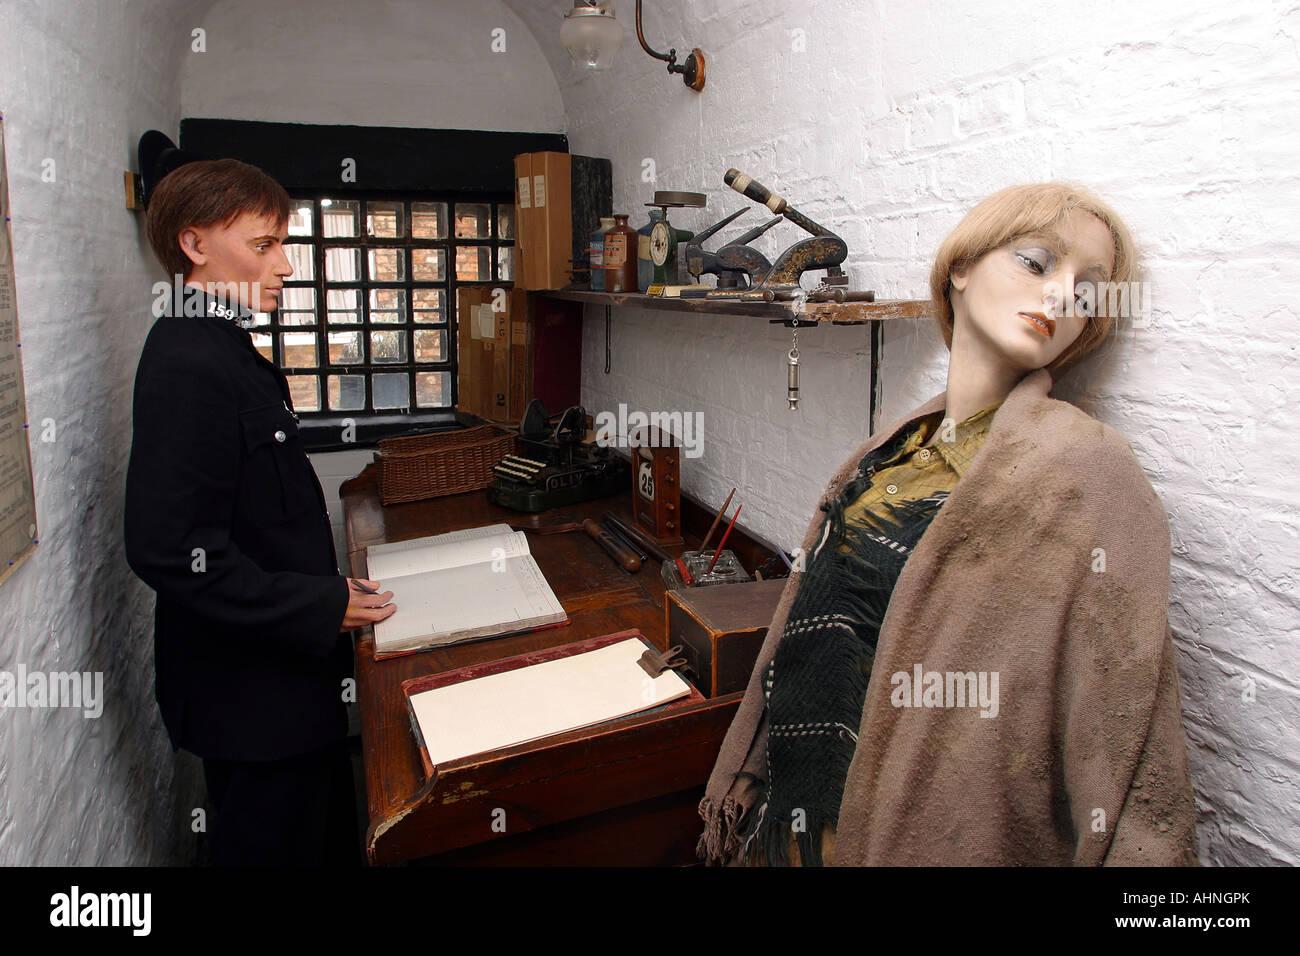 UK Yorkshire Ripon St Marygate House of Correction Museum Charge Desk - Stock Image